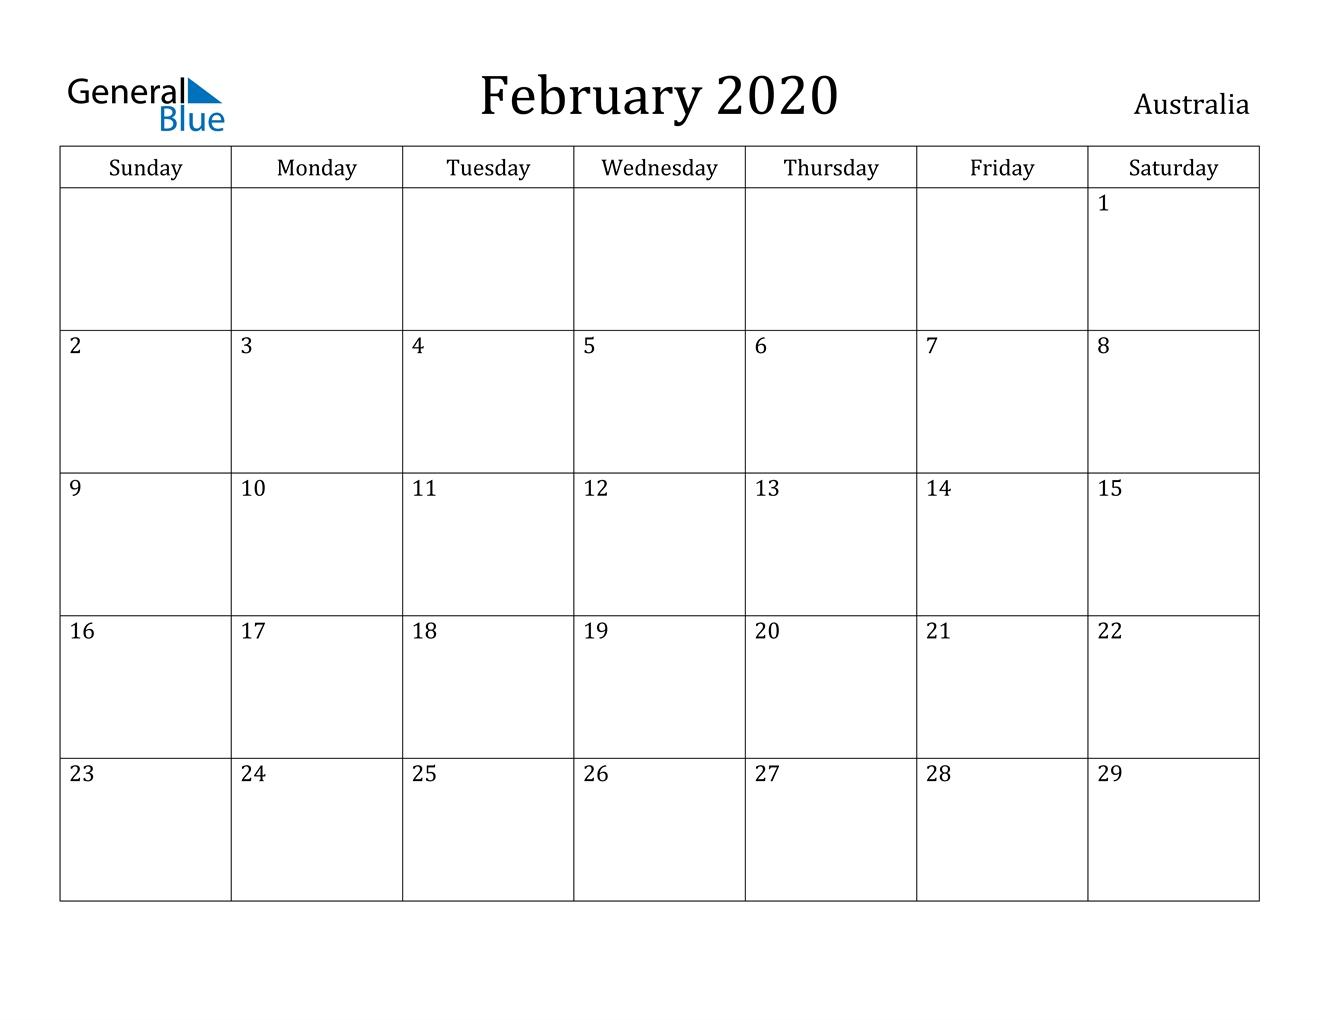 February 2020 Calendar - Australia